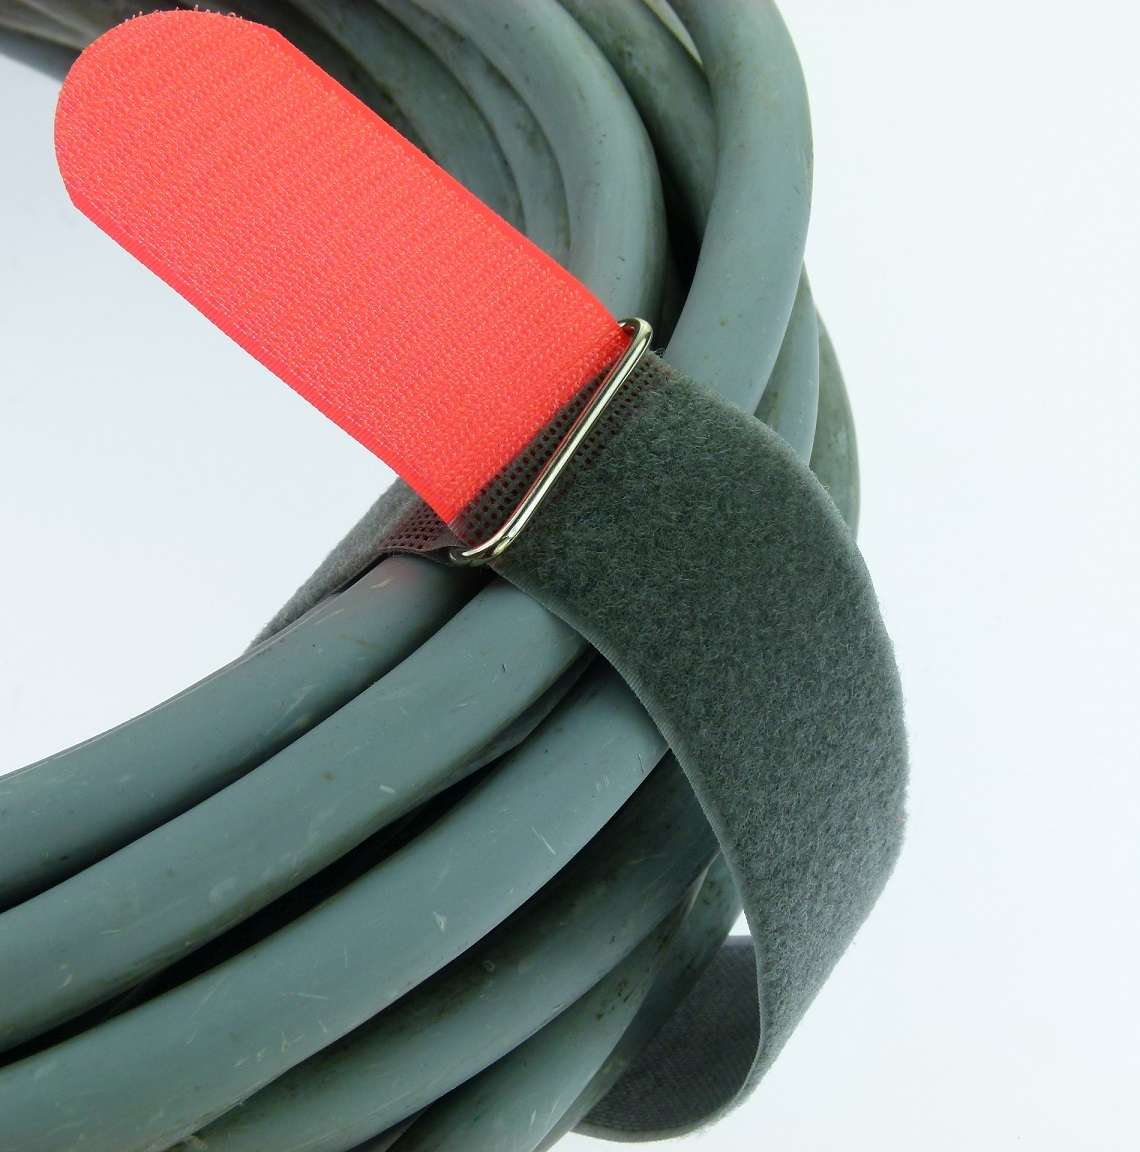 50 Klettkabelbinder m Öse 200 x 20 mm neongrün Kabelbinder Klettband Kabelklett